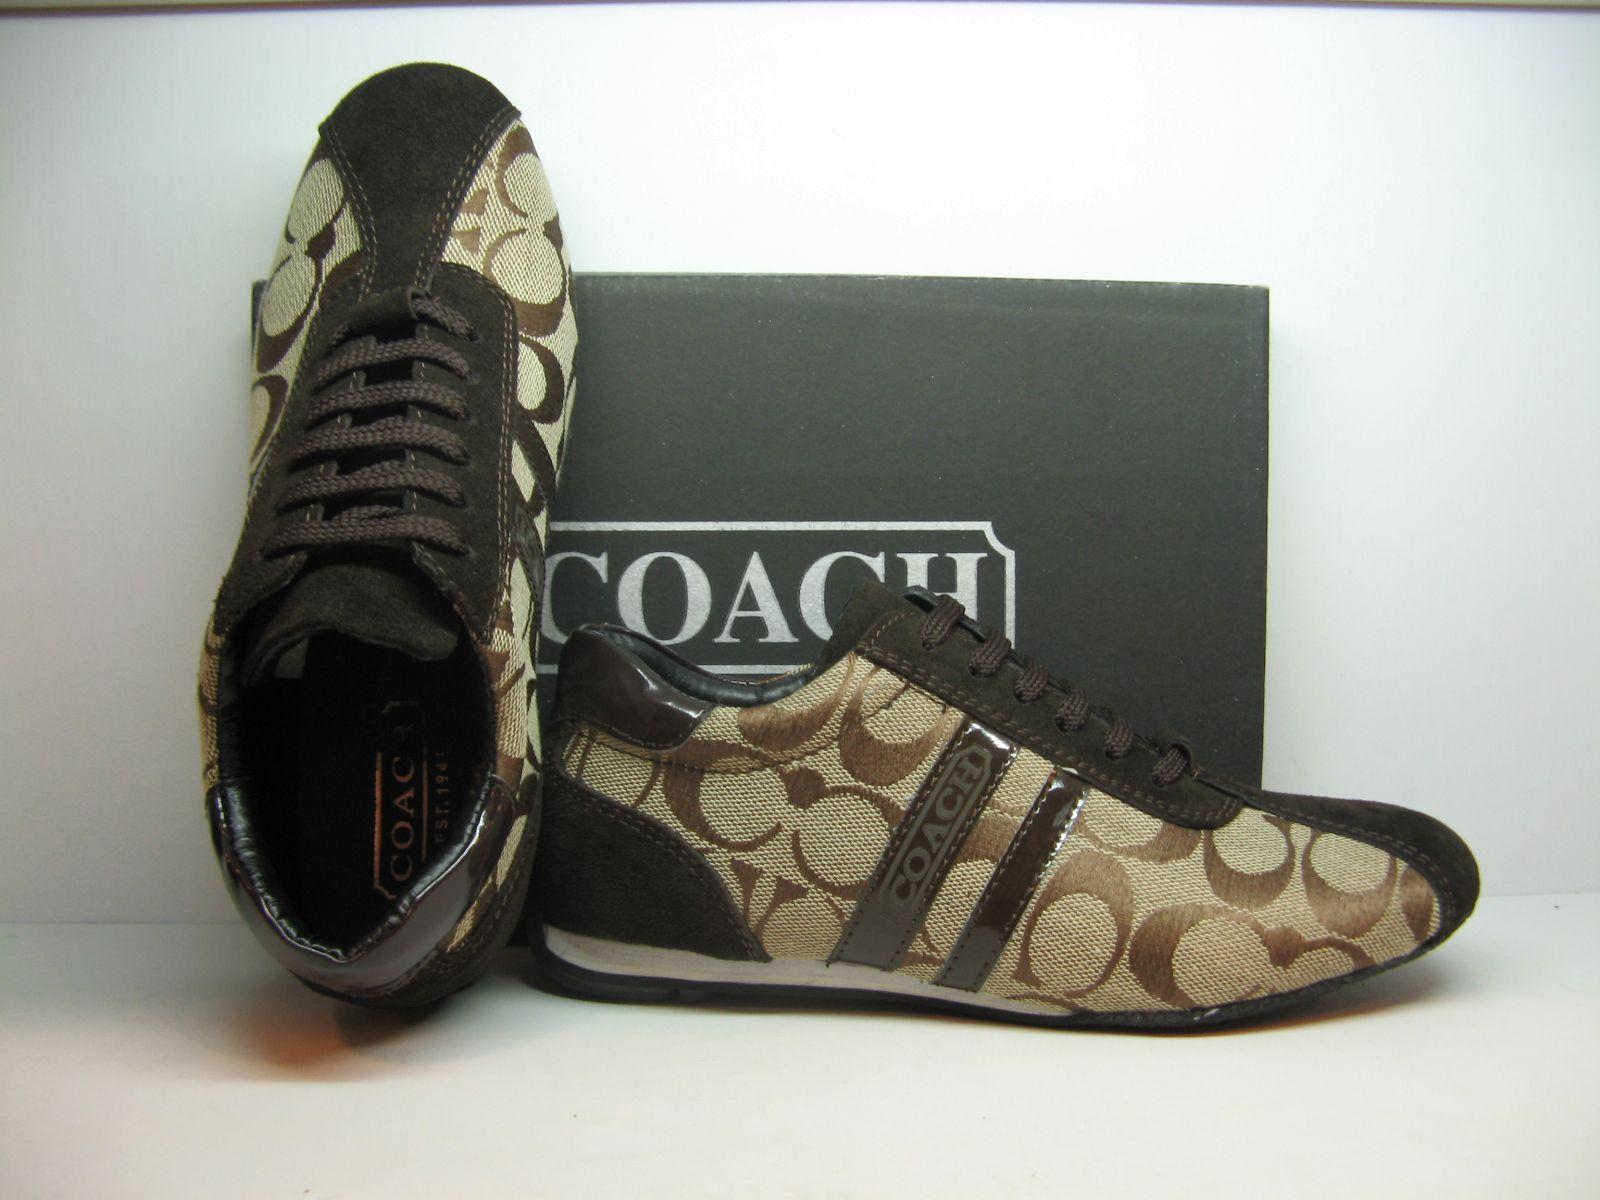 Coach tennis shoes, Coach boots